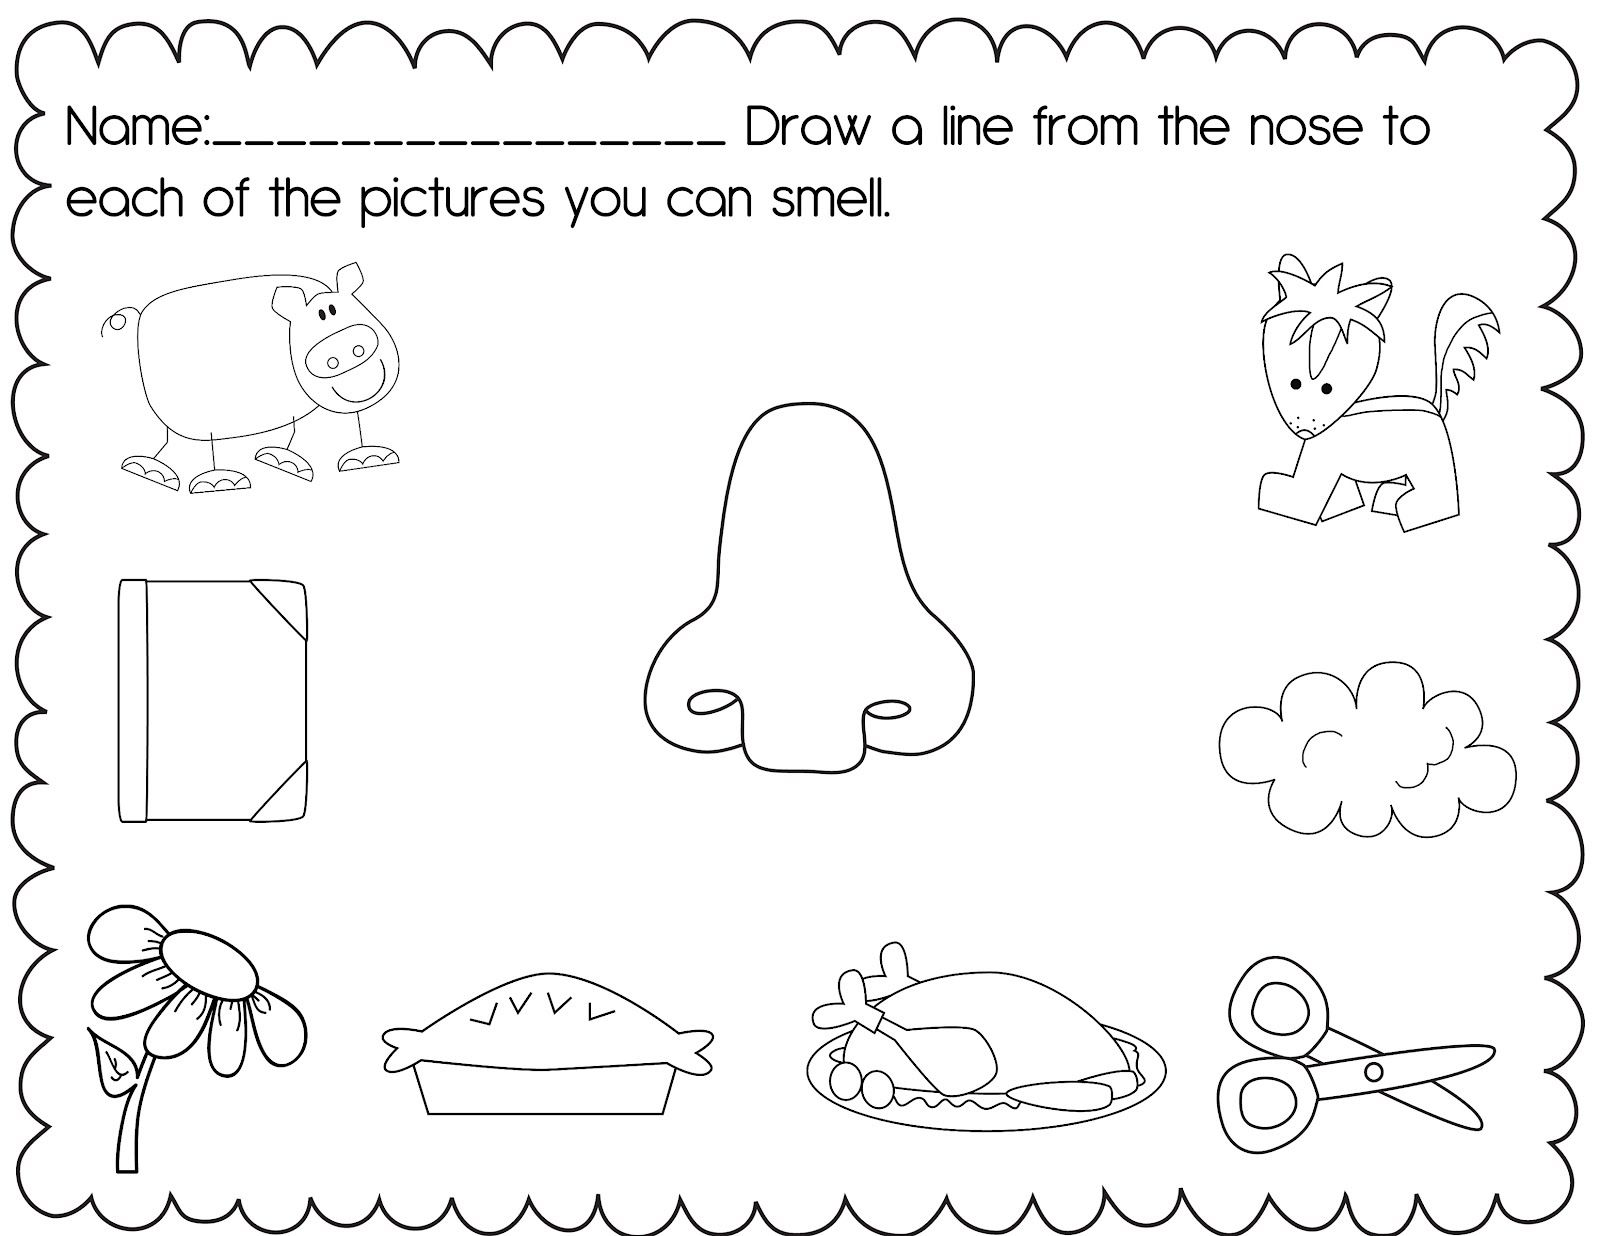 5 Senses Worksheets For Kindergarten Posted By Christine At 314